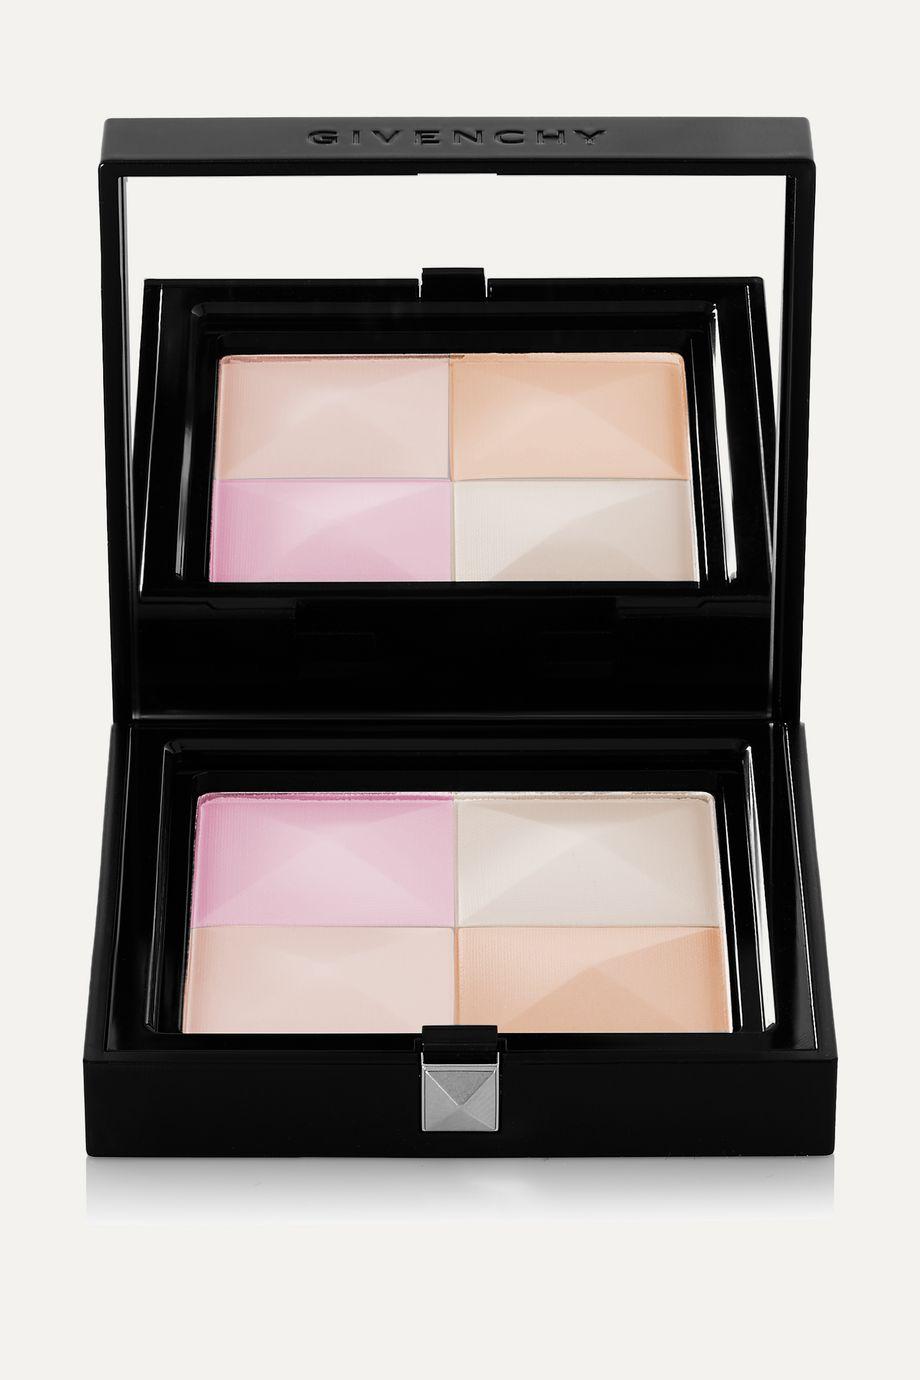 Givenchy Beauty Prisme Visage - Popeline Rose No.3